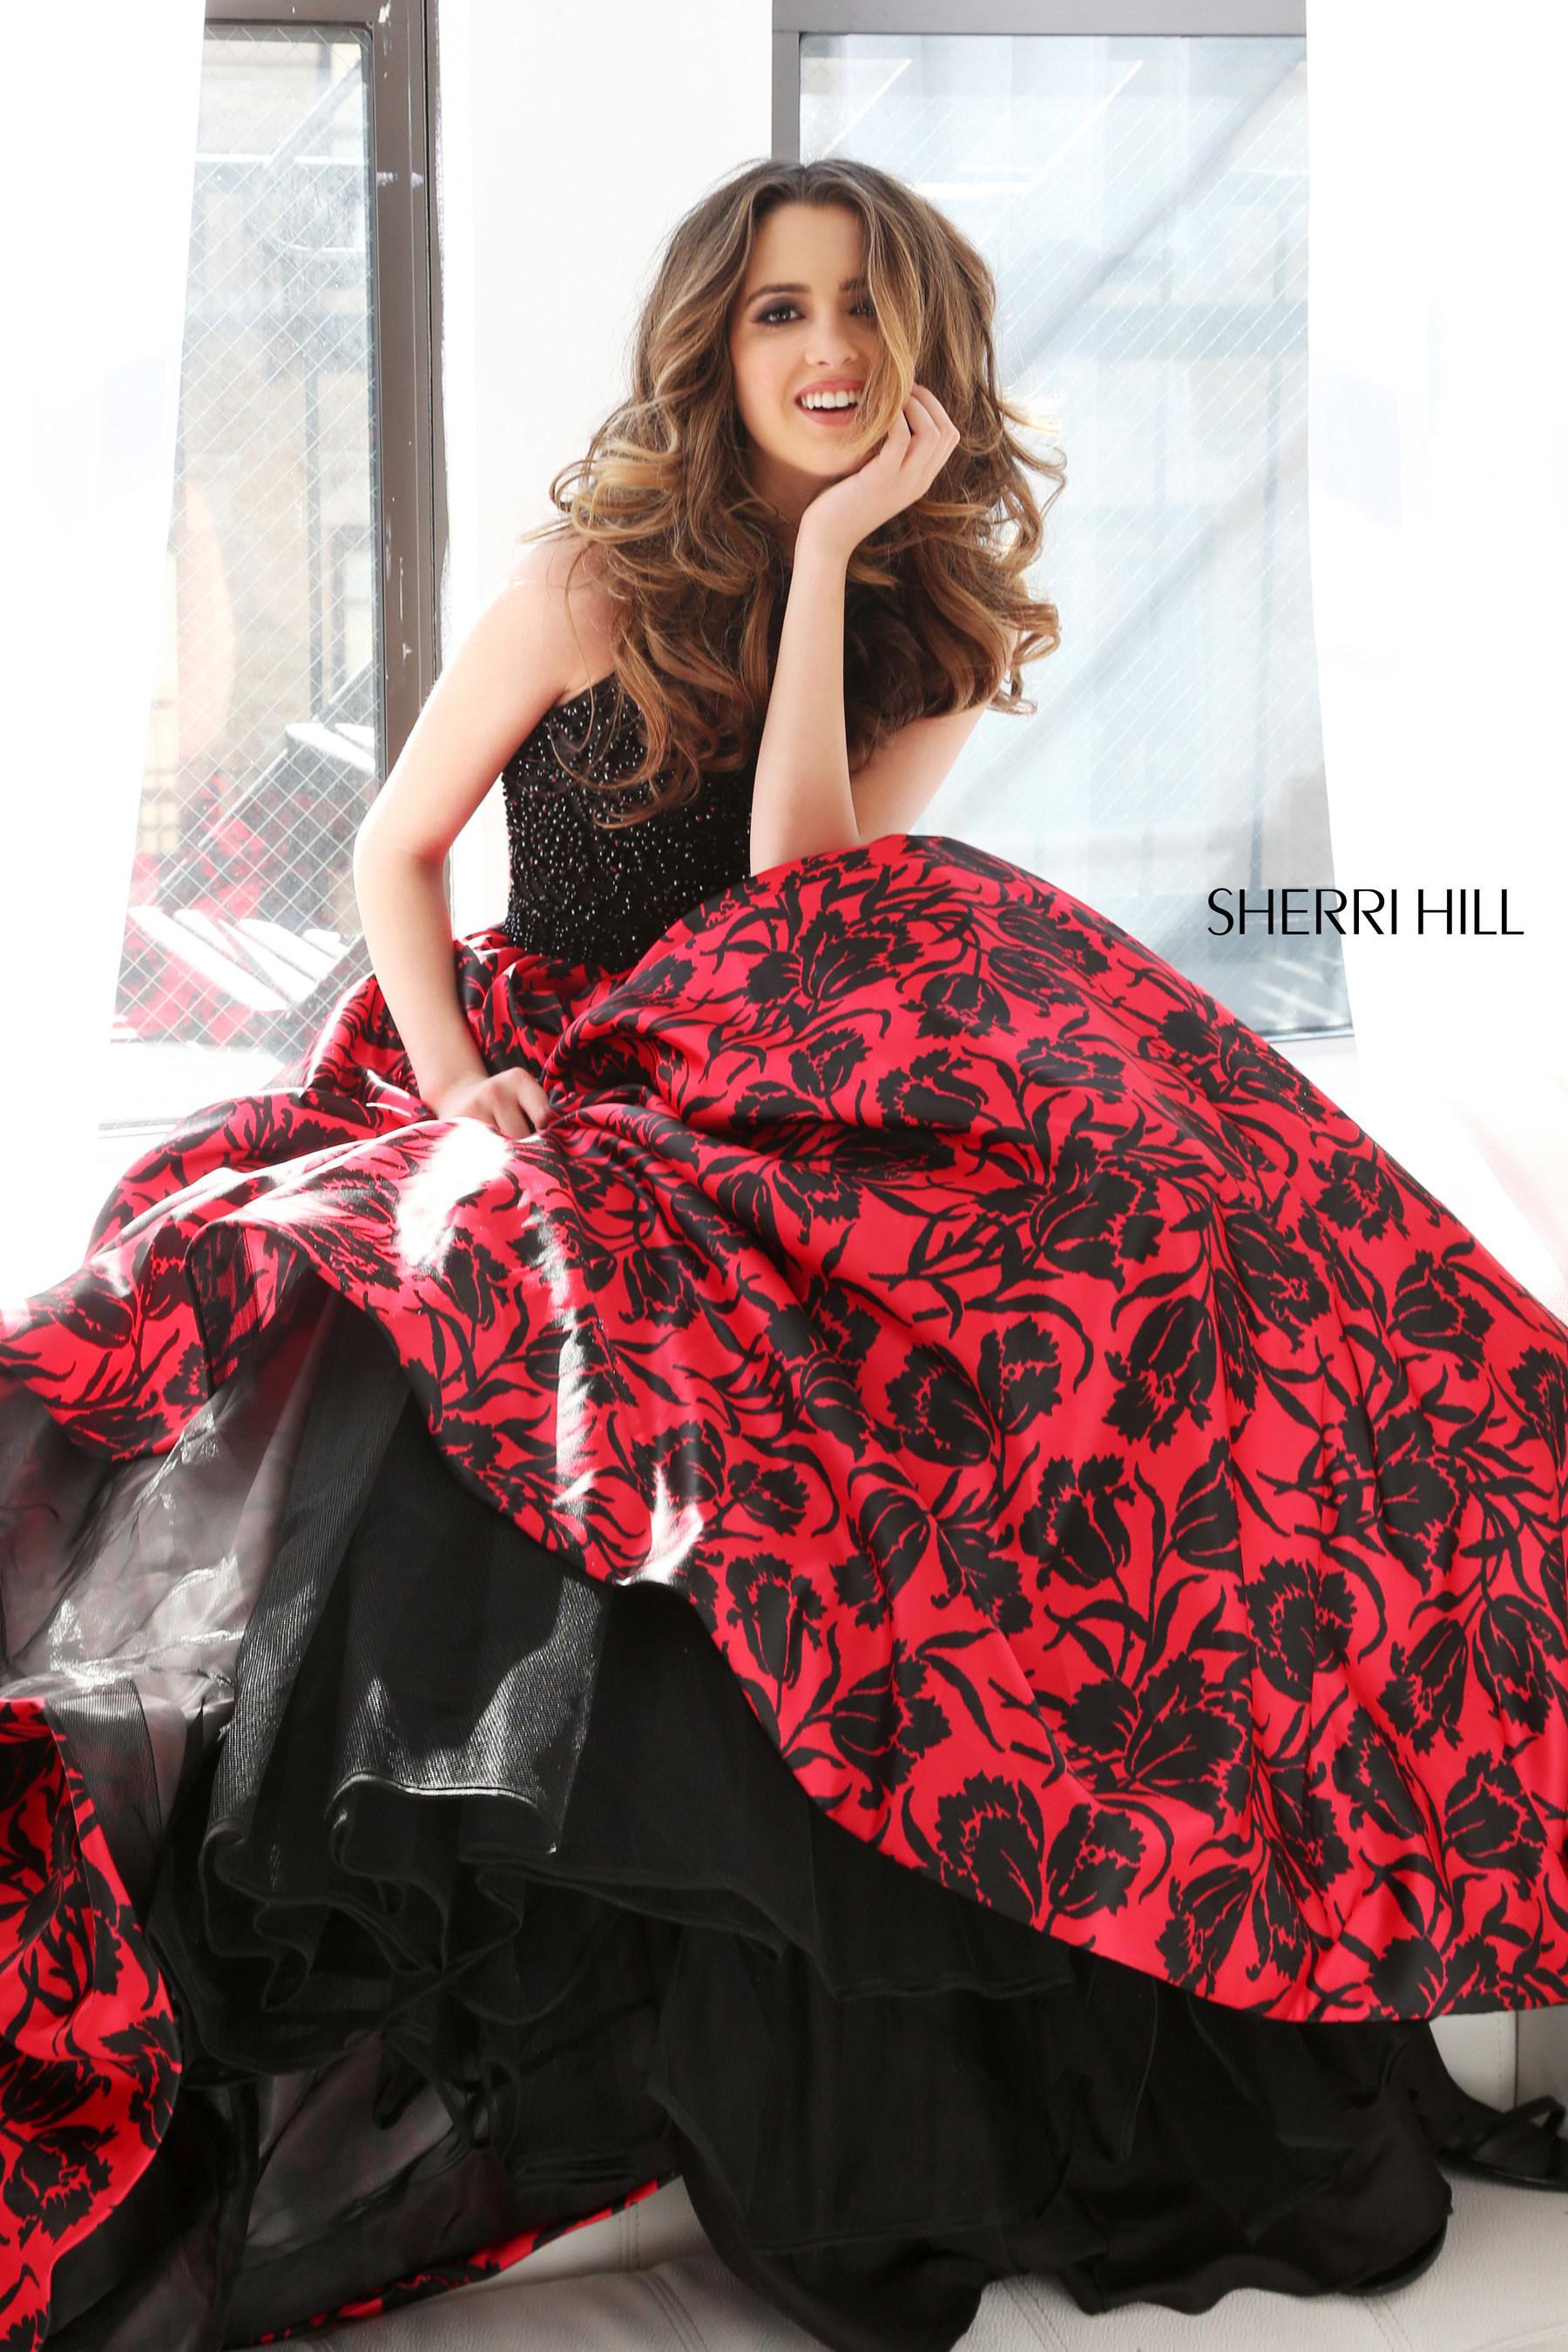 Austin & Ally Star Laura Marano Collaborates with Sherri